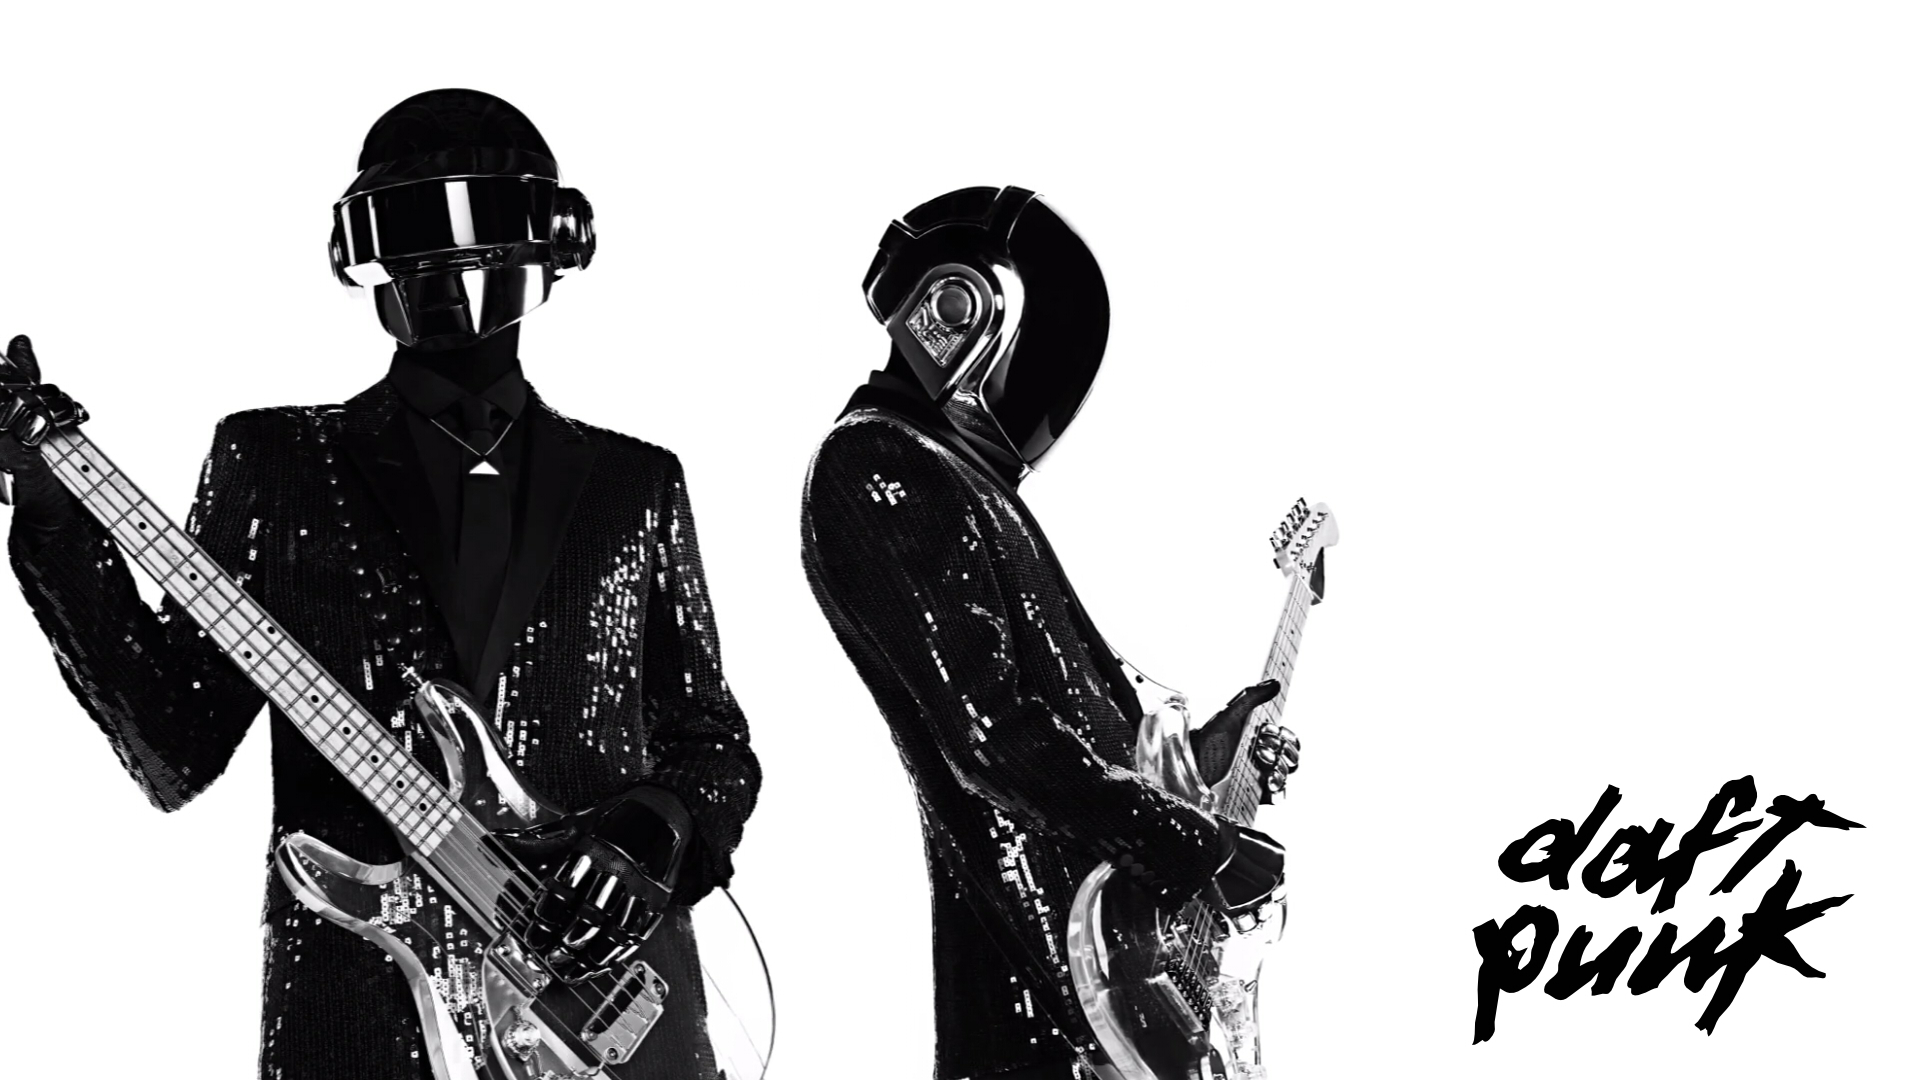 Daft Punk wallpaper | 1920x1080 | #54856